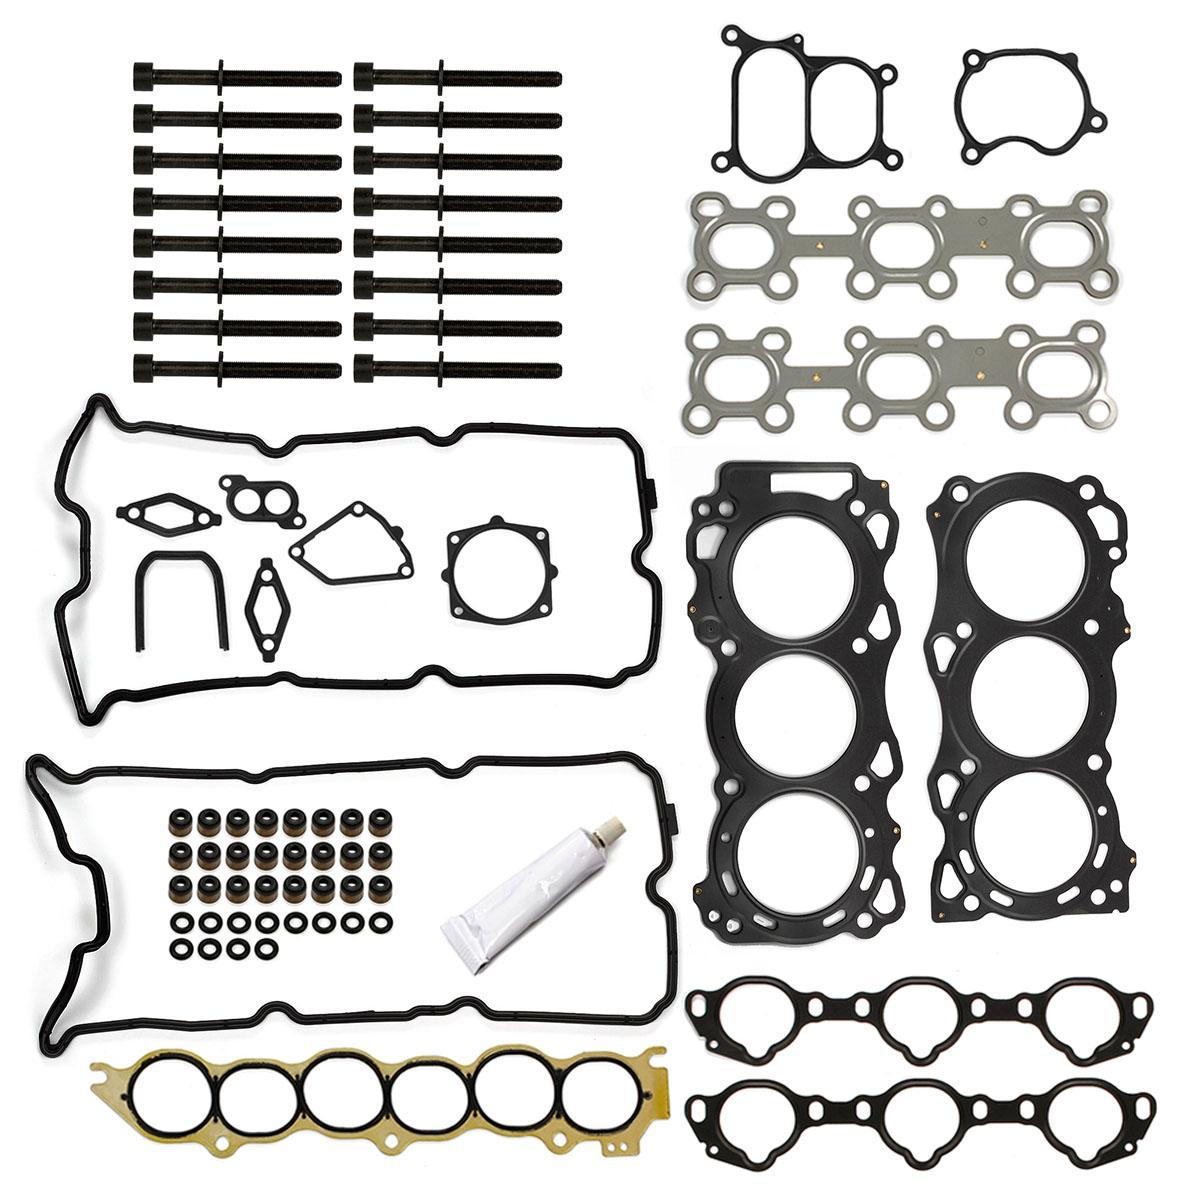 infiniti i35 repair manual